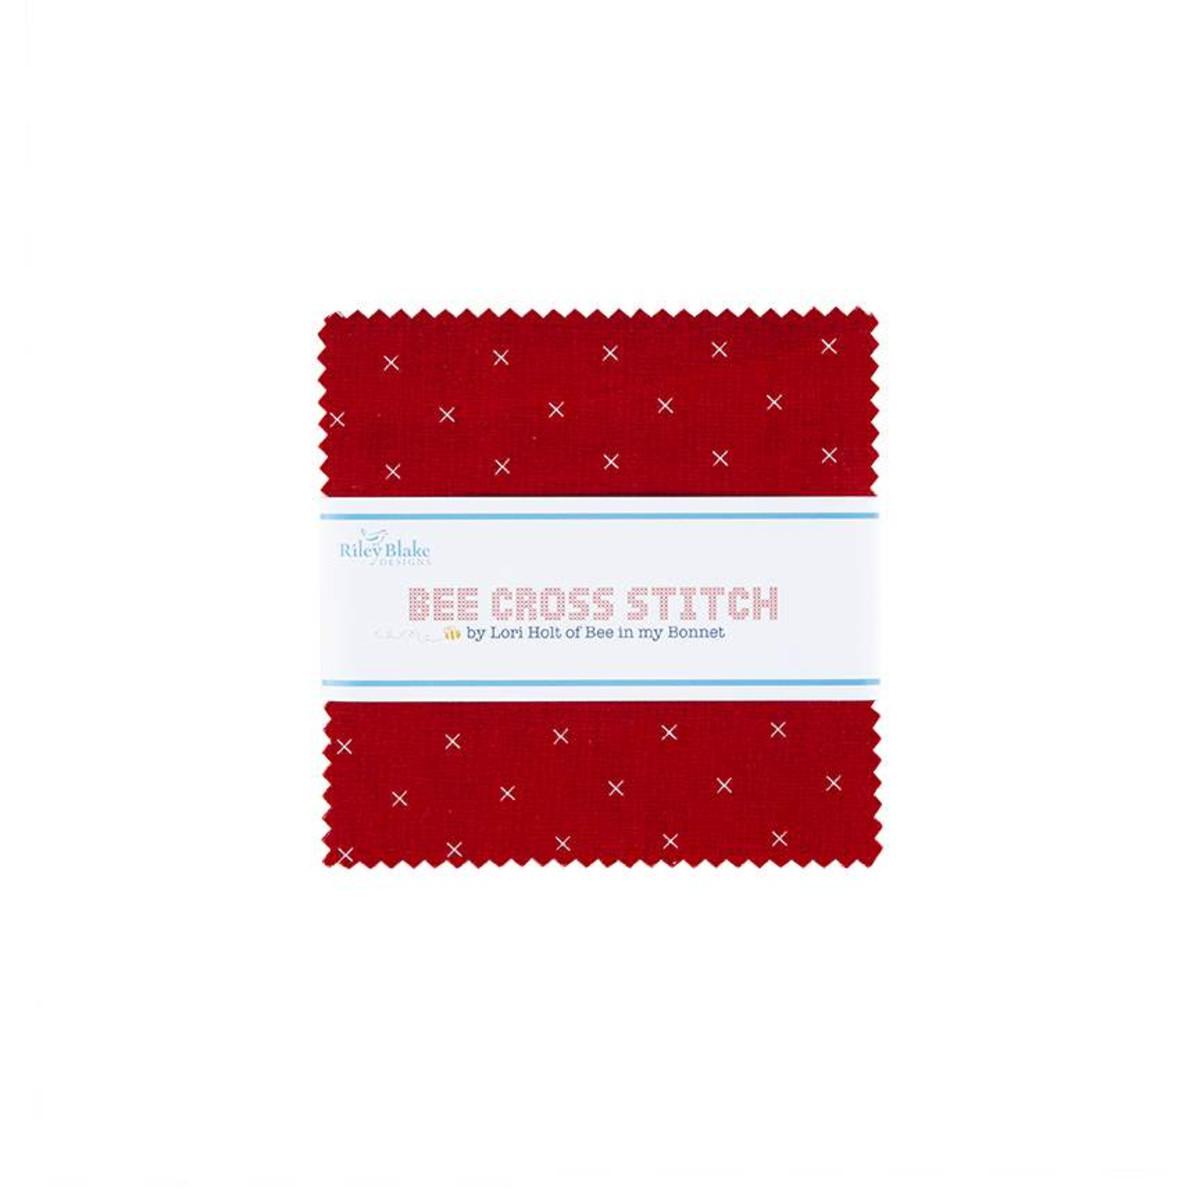 Riley Blake Charm Pack - Bee Cross Stitch by Lori Holt